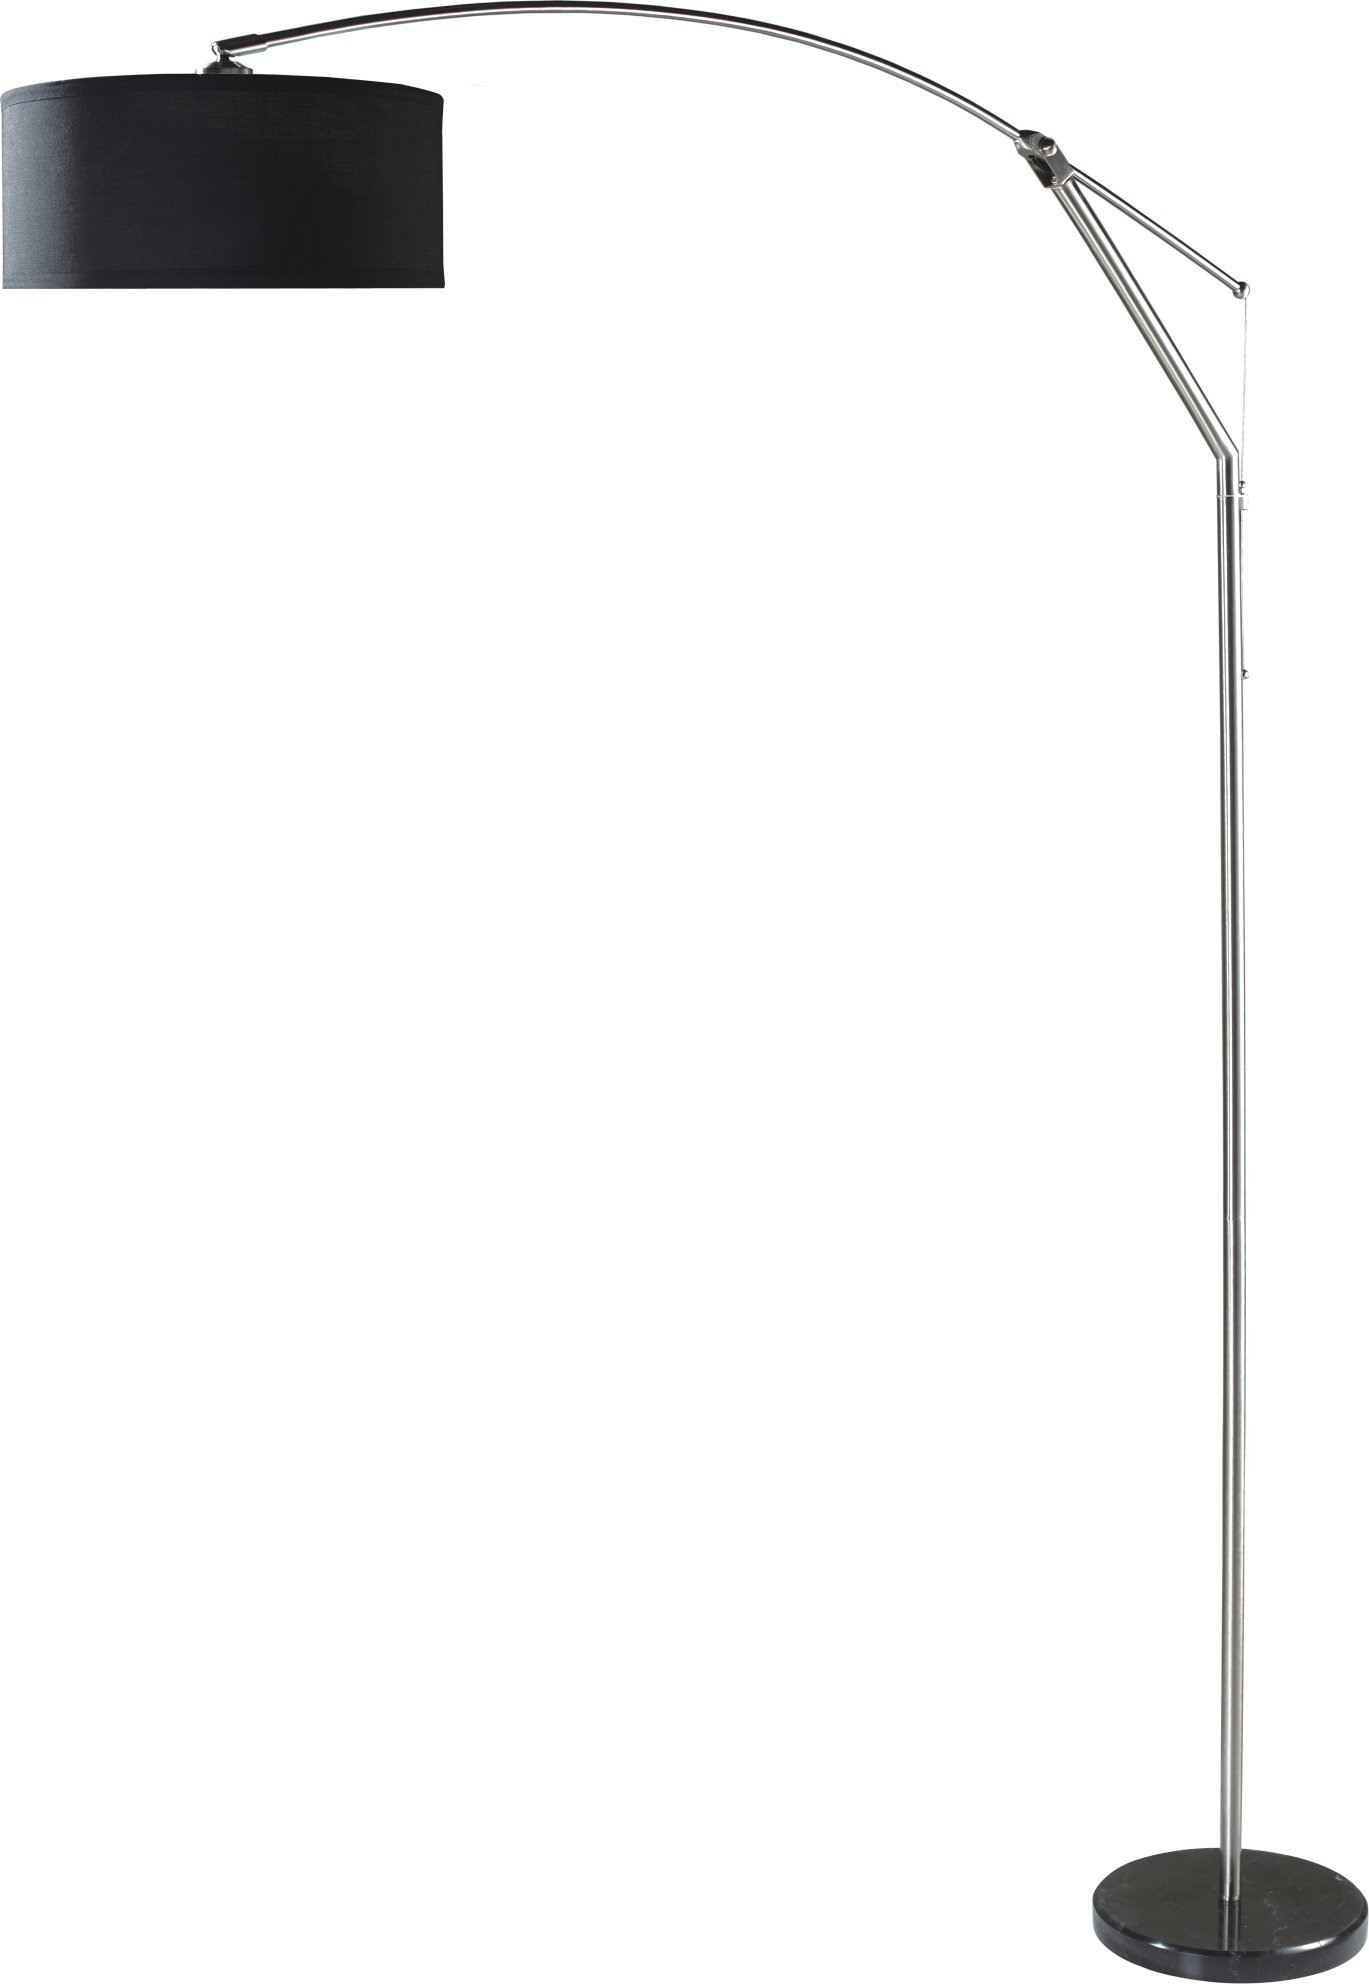 Milton Greens Stars A6933BK Suzie Adjustable Contemporary Arc Floor Lamp, 80-Inch, Black